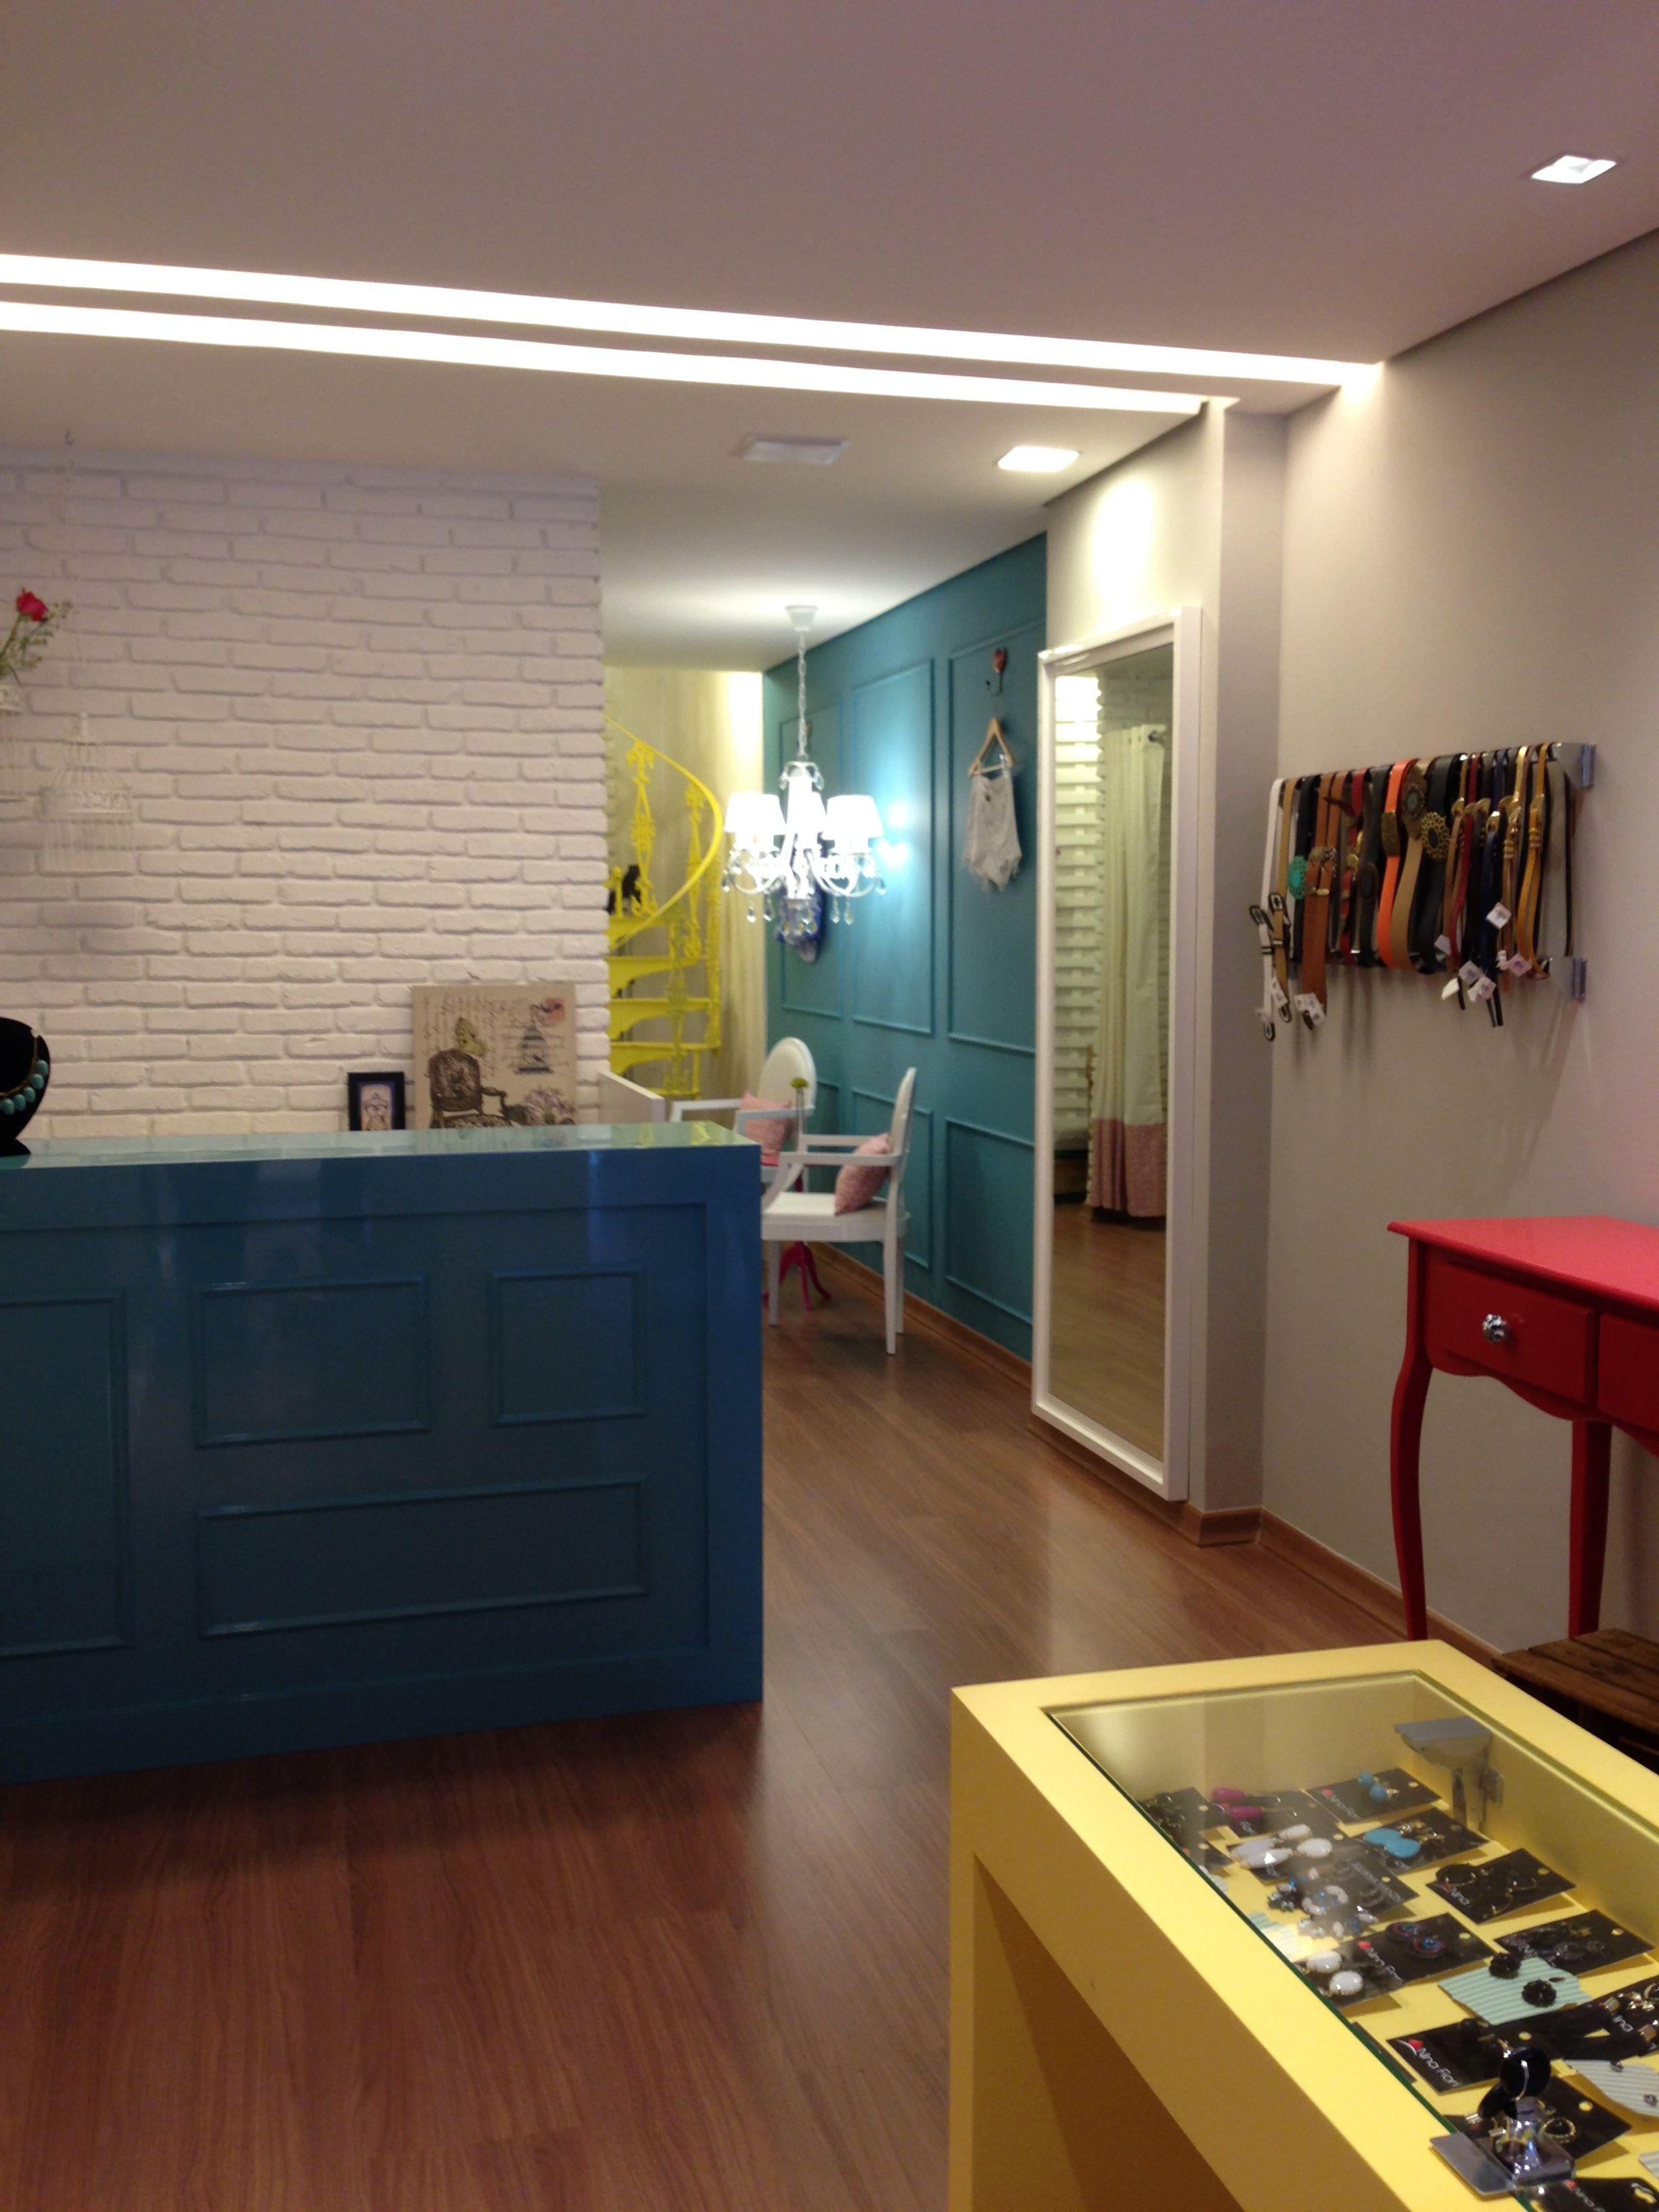 Loja Roupa Feminina Amis Arquitetura Loja De Roupa Design De